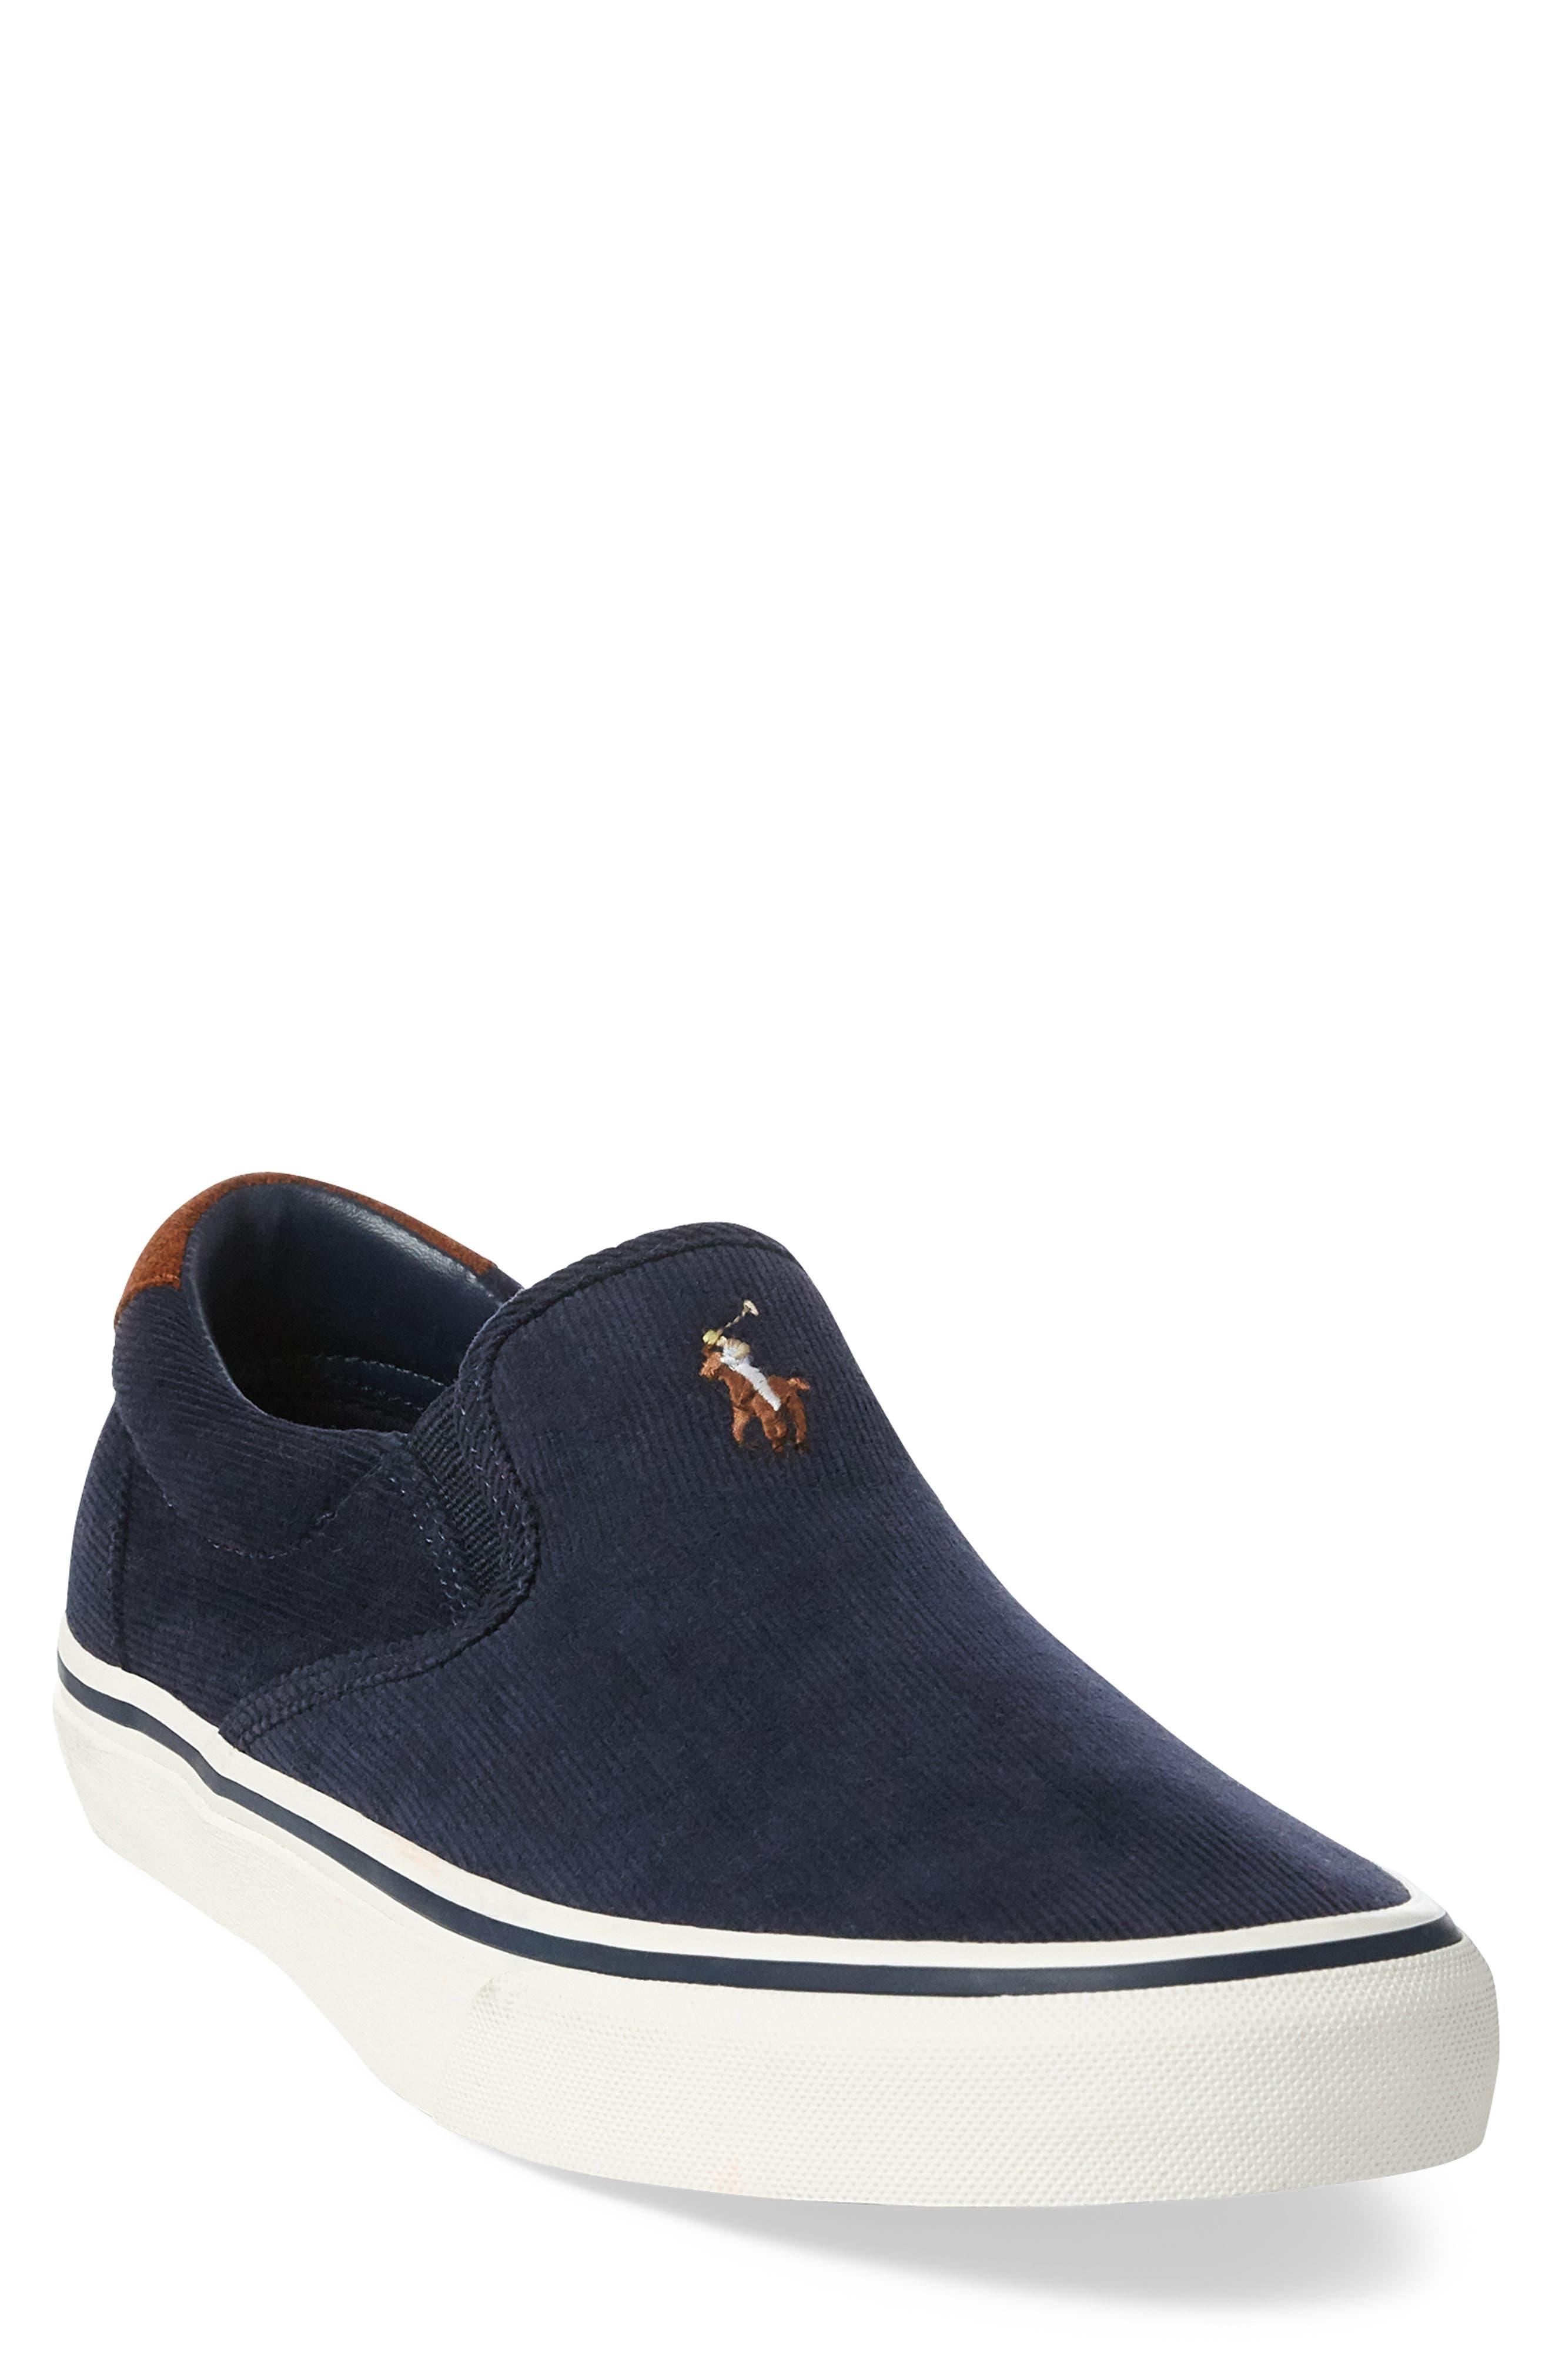 Thompson Corduroy Slip-On Sneaker,                             Main thumbnail 1, color,                             NAVY